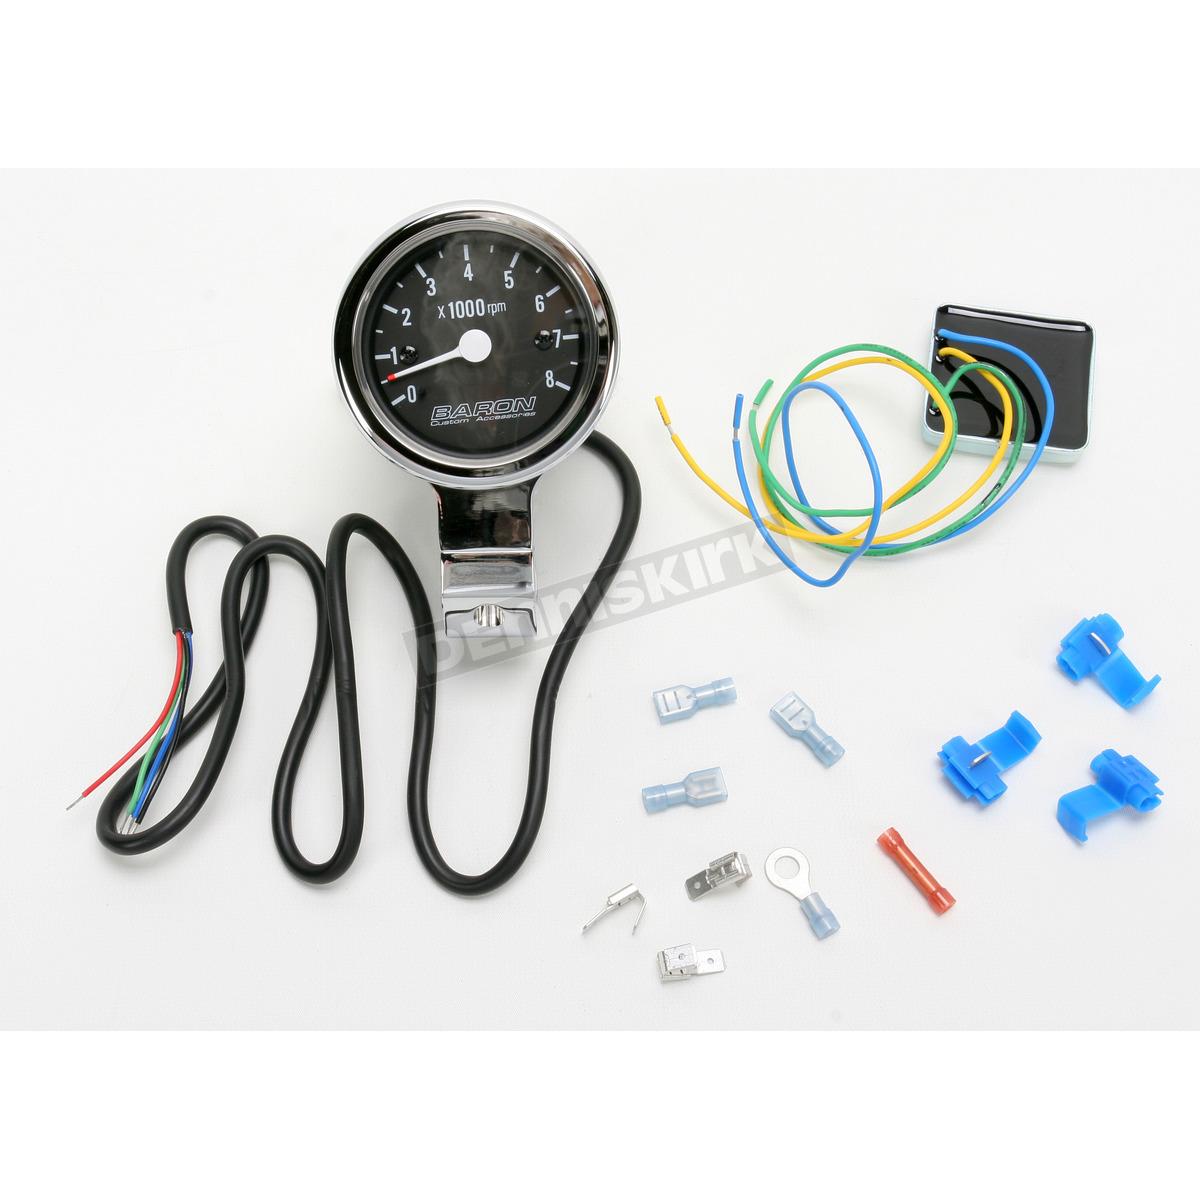 Cobra Motorcycle Tachometer Wiring Diagram - Ignitioncar Wiring Diagram  Page 2 - viiintage.yenpancane.jeanjaures37.fr | Cobra Tachometer Wiring Diagram |  | Wiring Diagram Resource